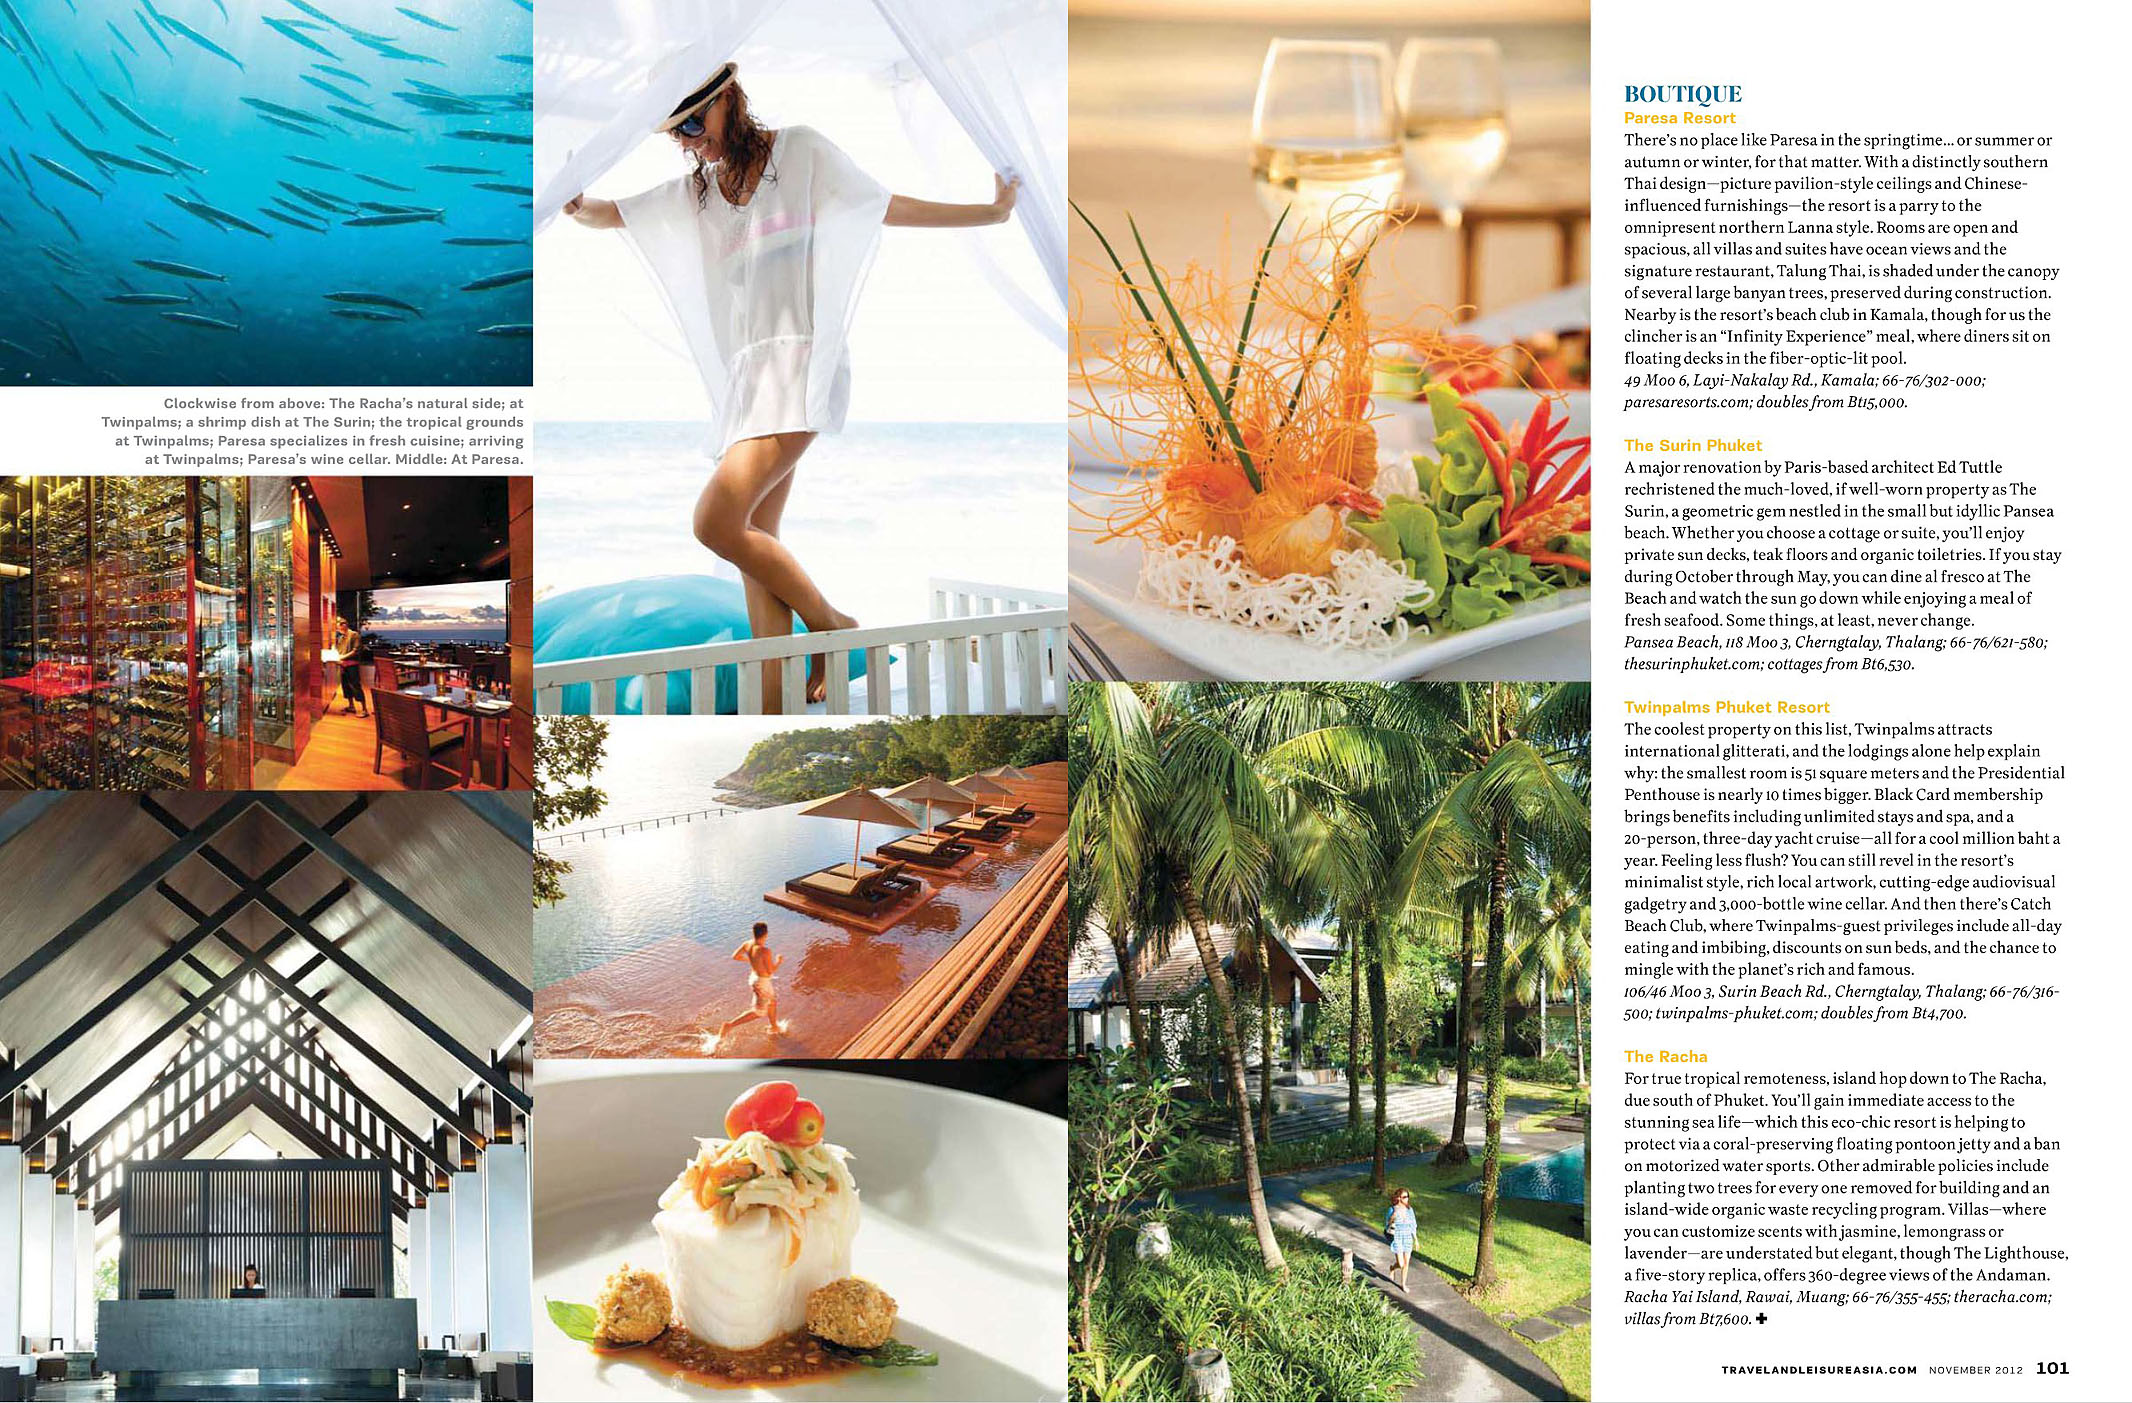 Travel & Leisure SA 2012-11-05.jpg